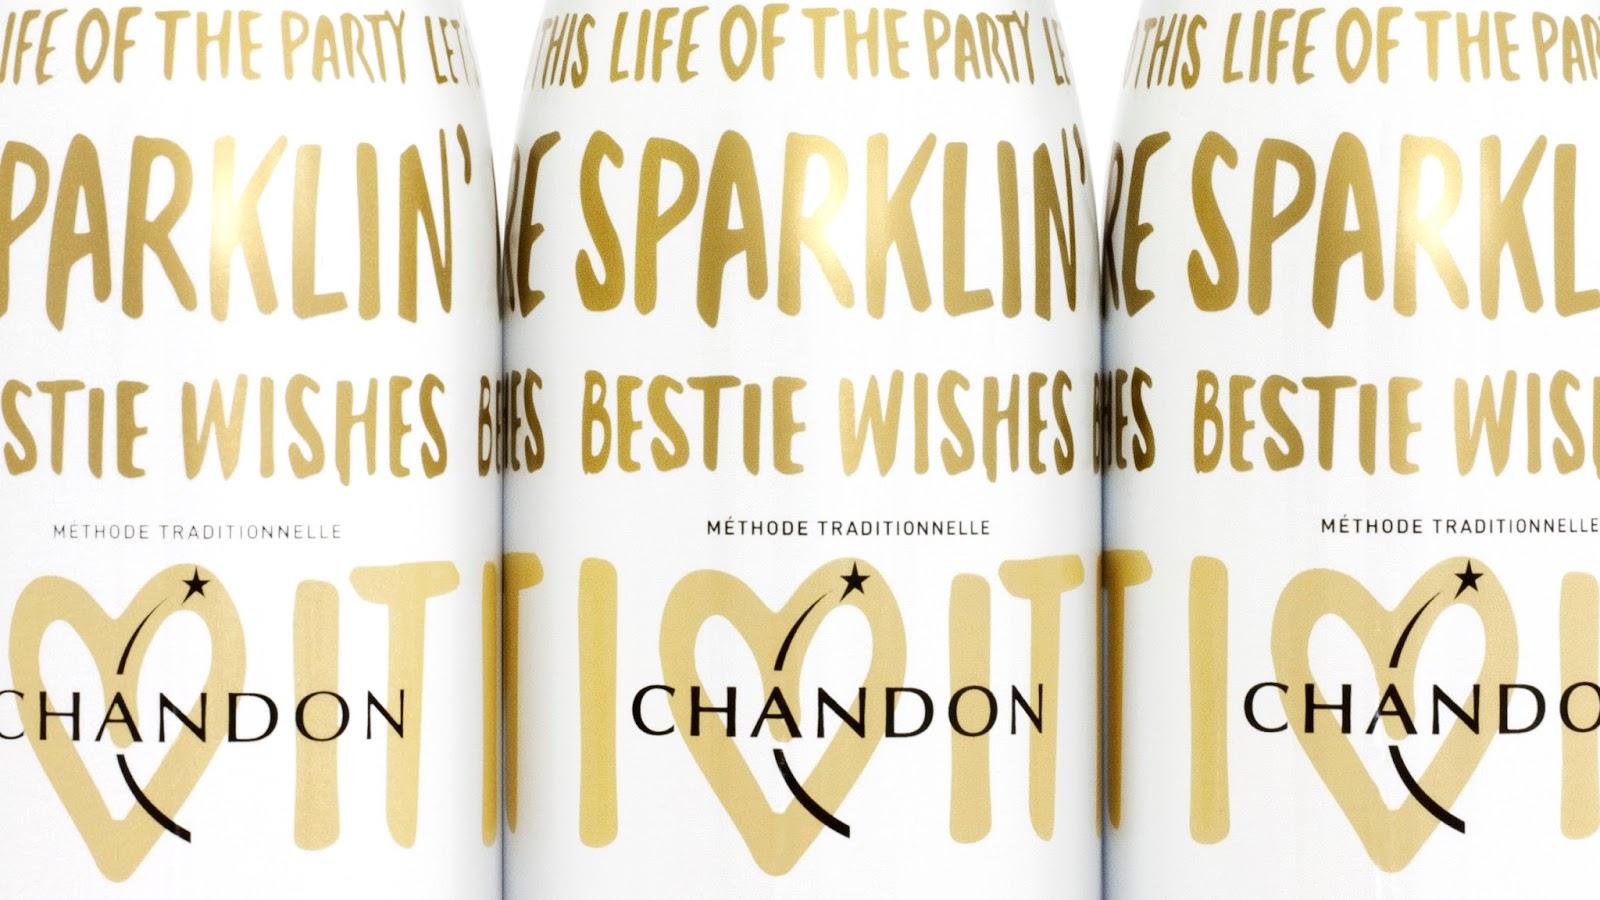 BestieWishes-Chandon-03